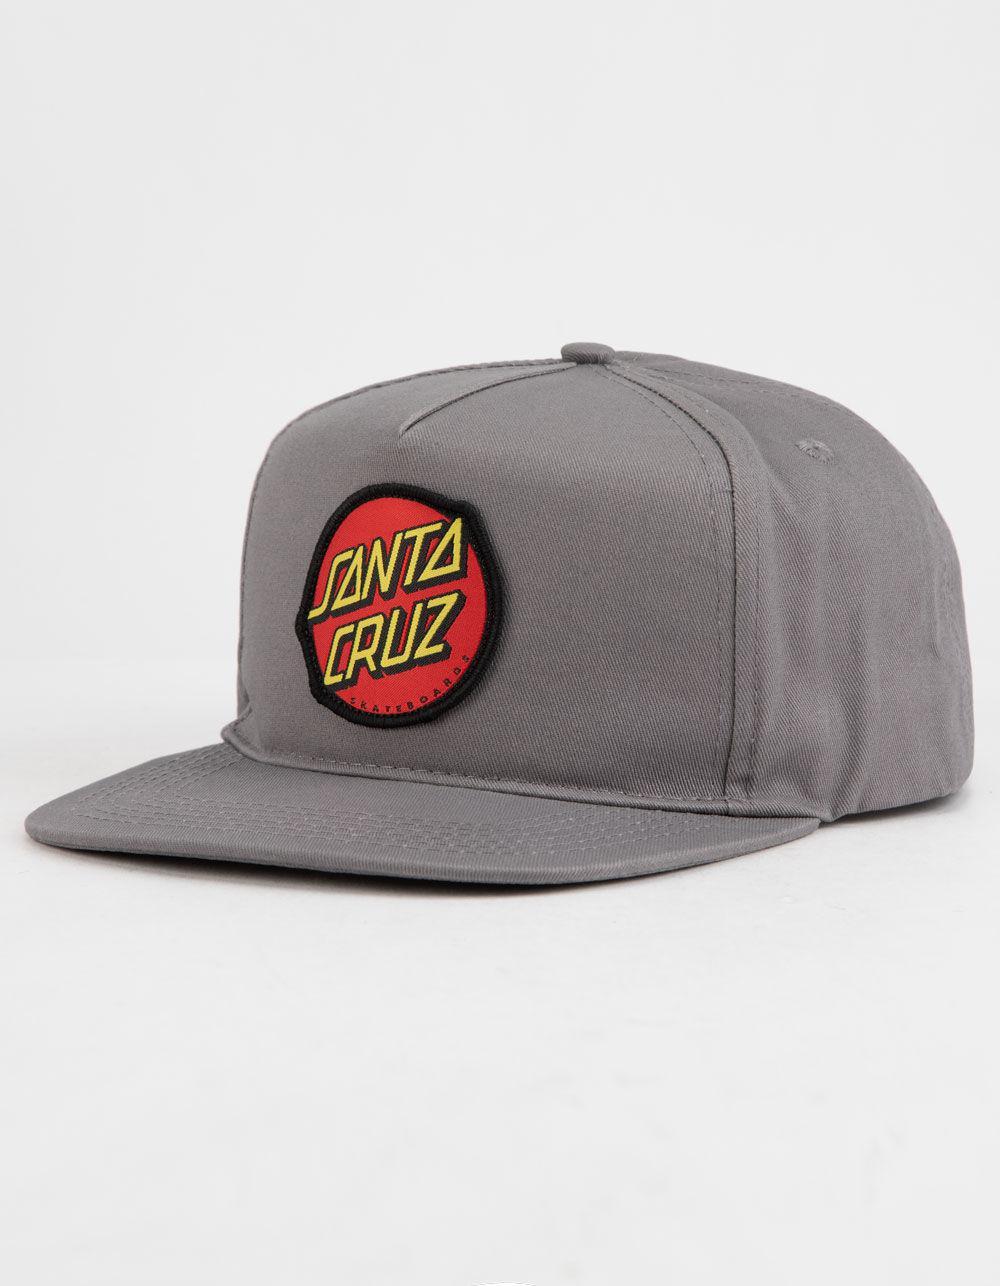 4c9ccd9ed89 Lyst - Santa Cruz Classic Gray Mens Snapback Hat in Gray for Men